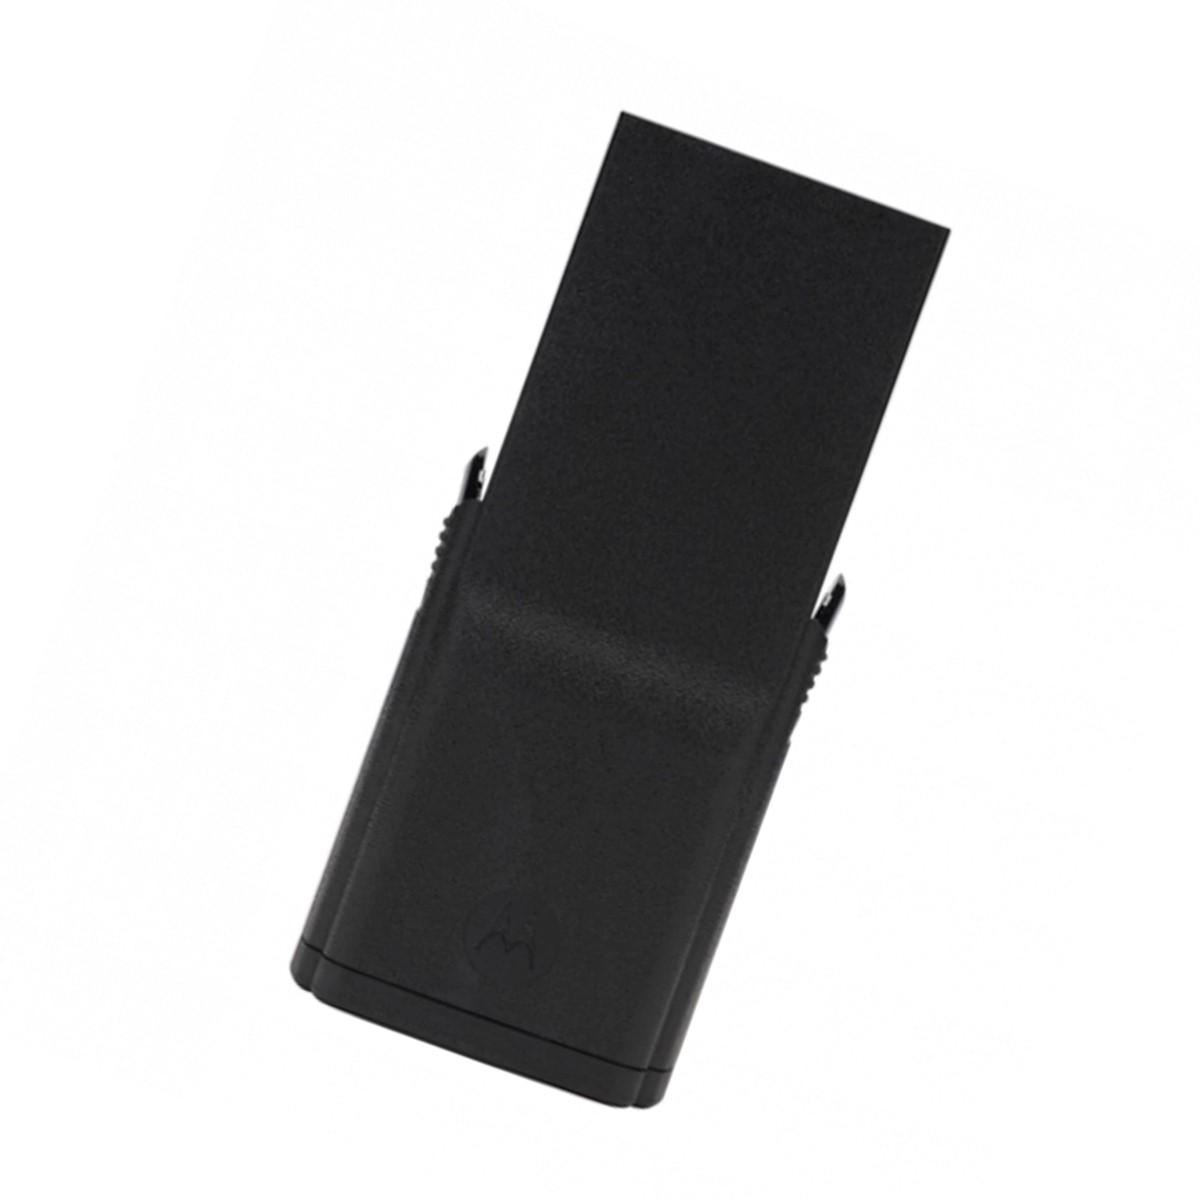 Batería Motorola Ni-MH 2000 mAh para radio APX7000XE NNTN7036A